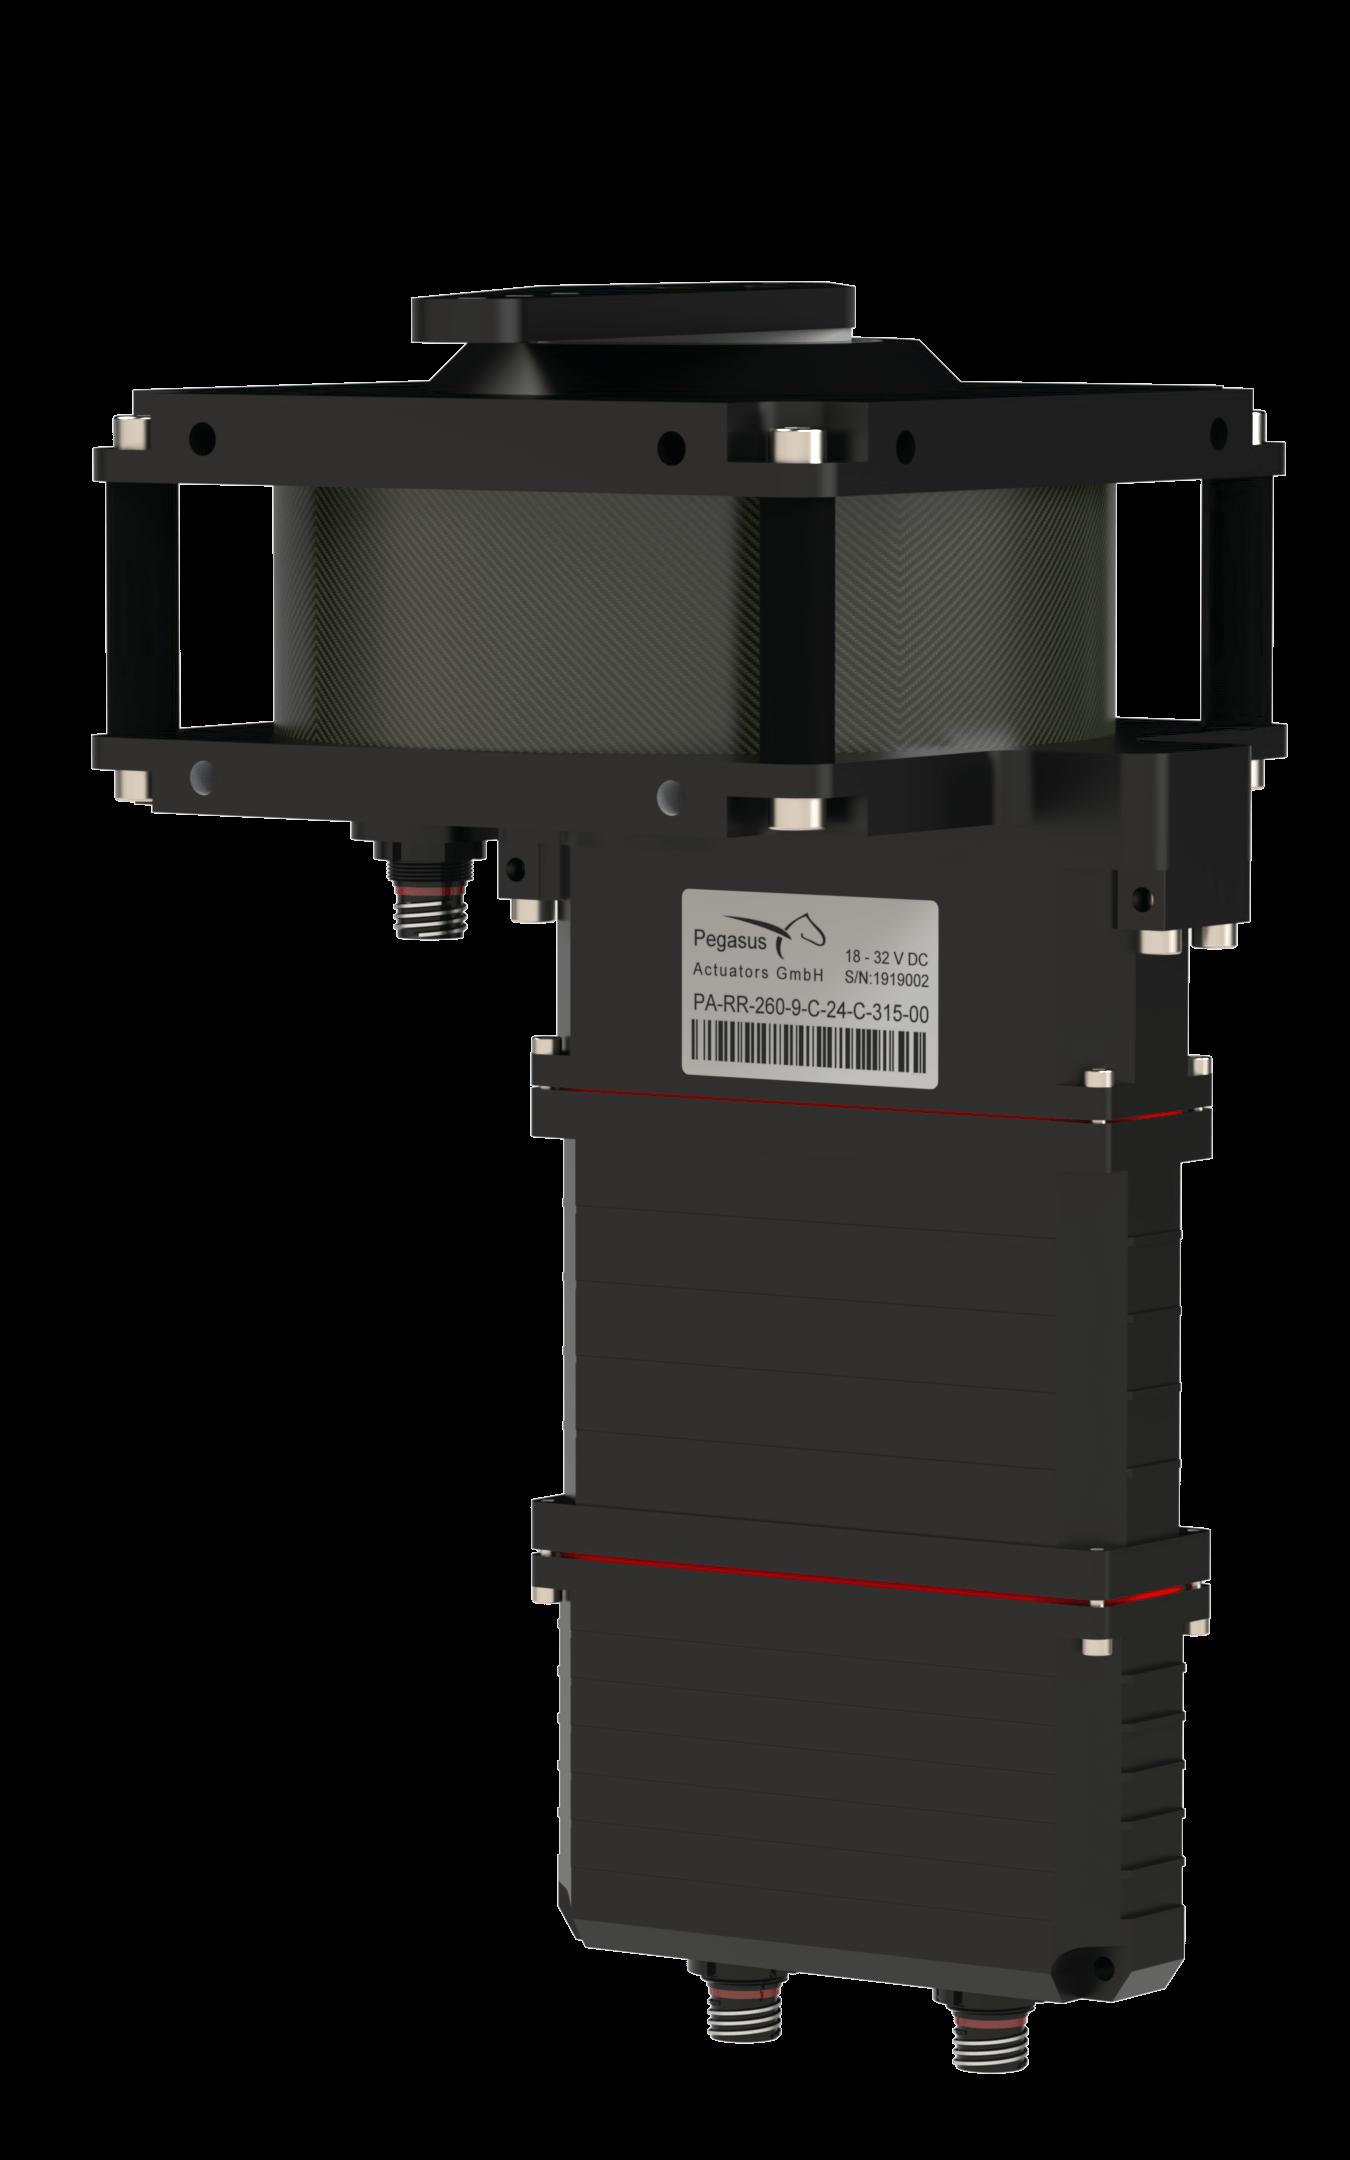 PA-RR-260-9-OPV Actuators